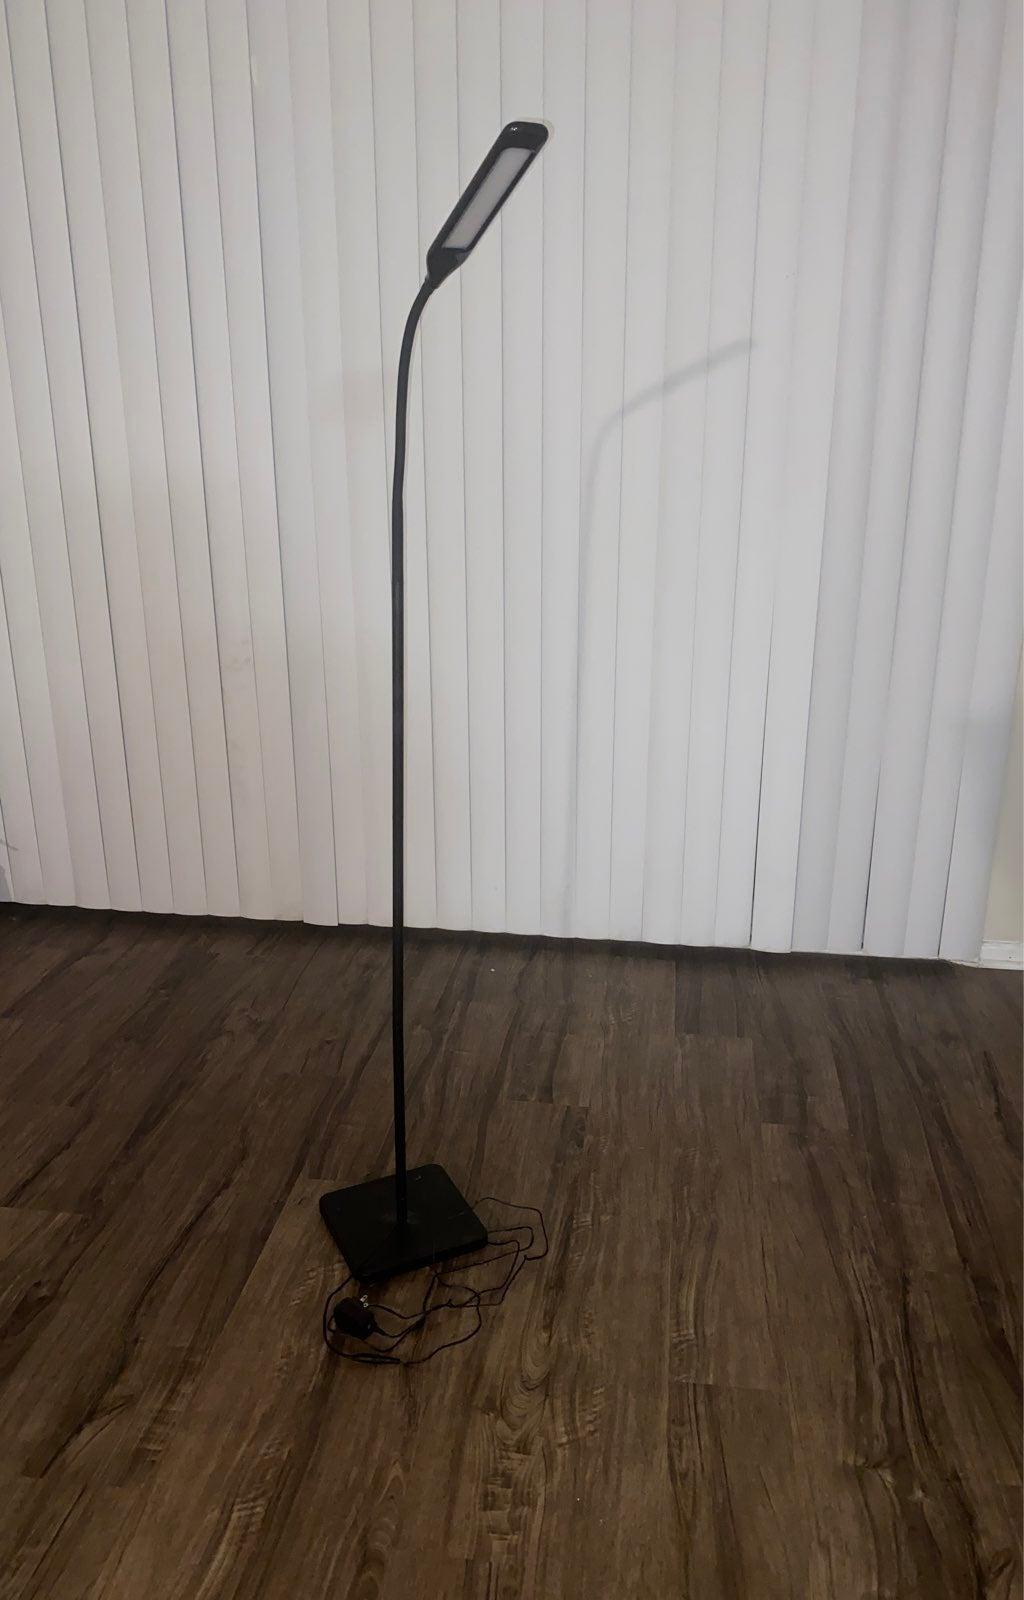 led light stand